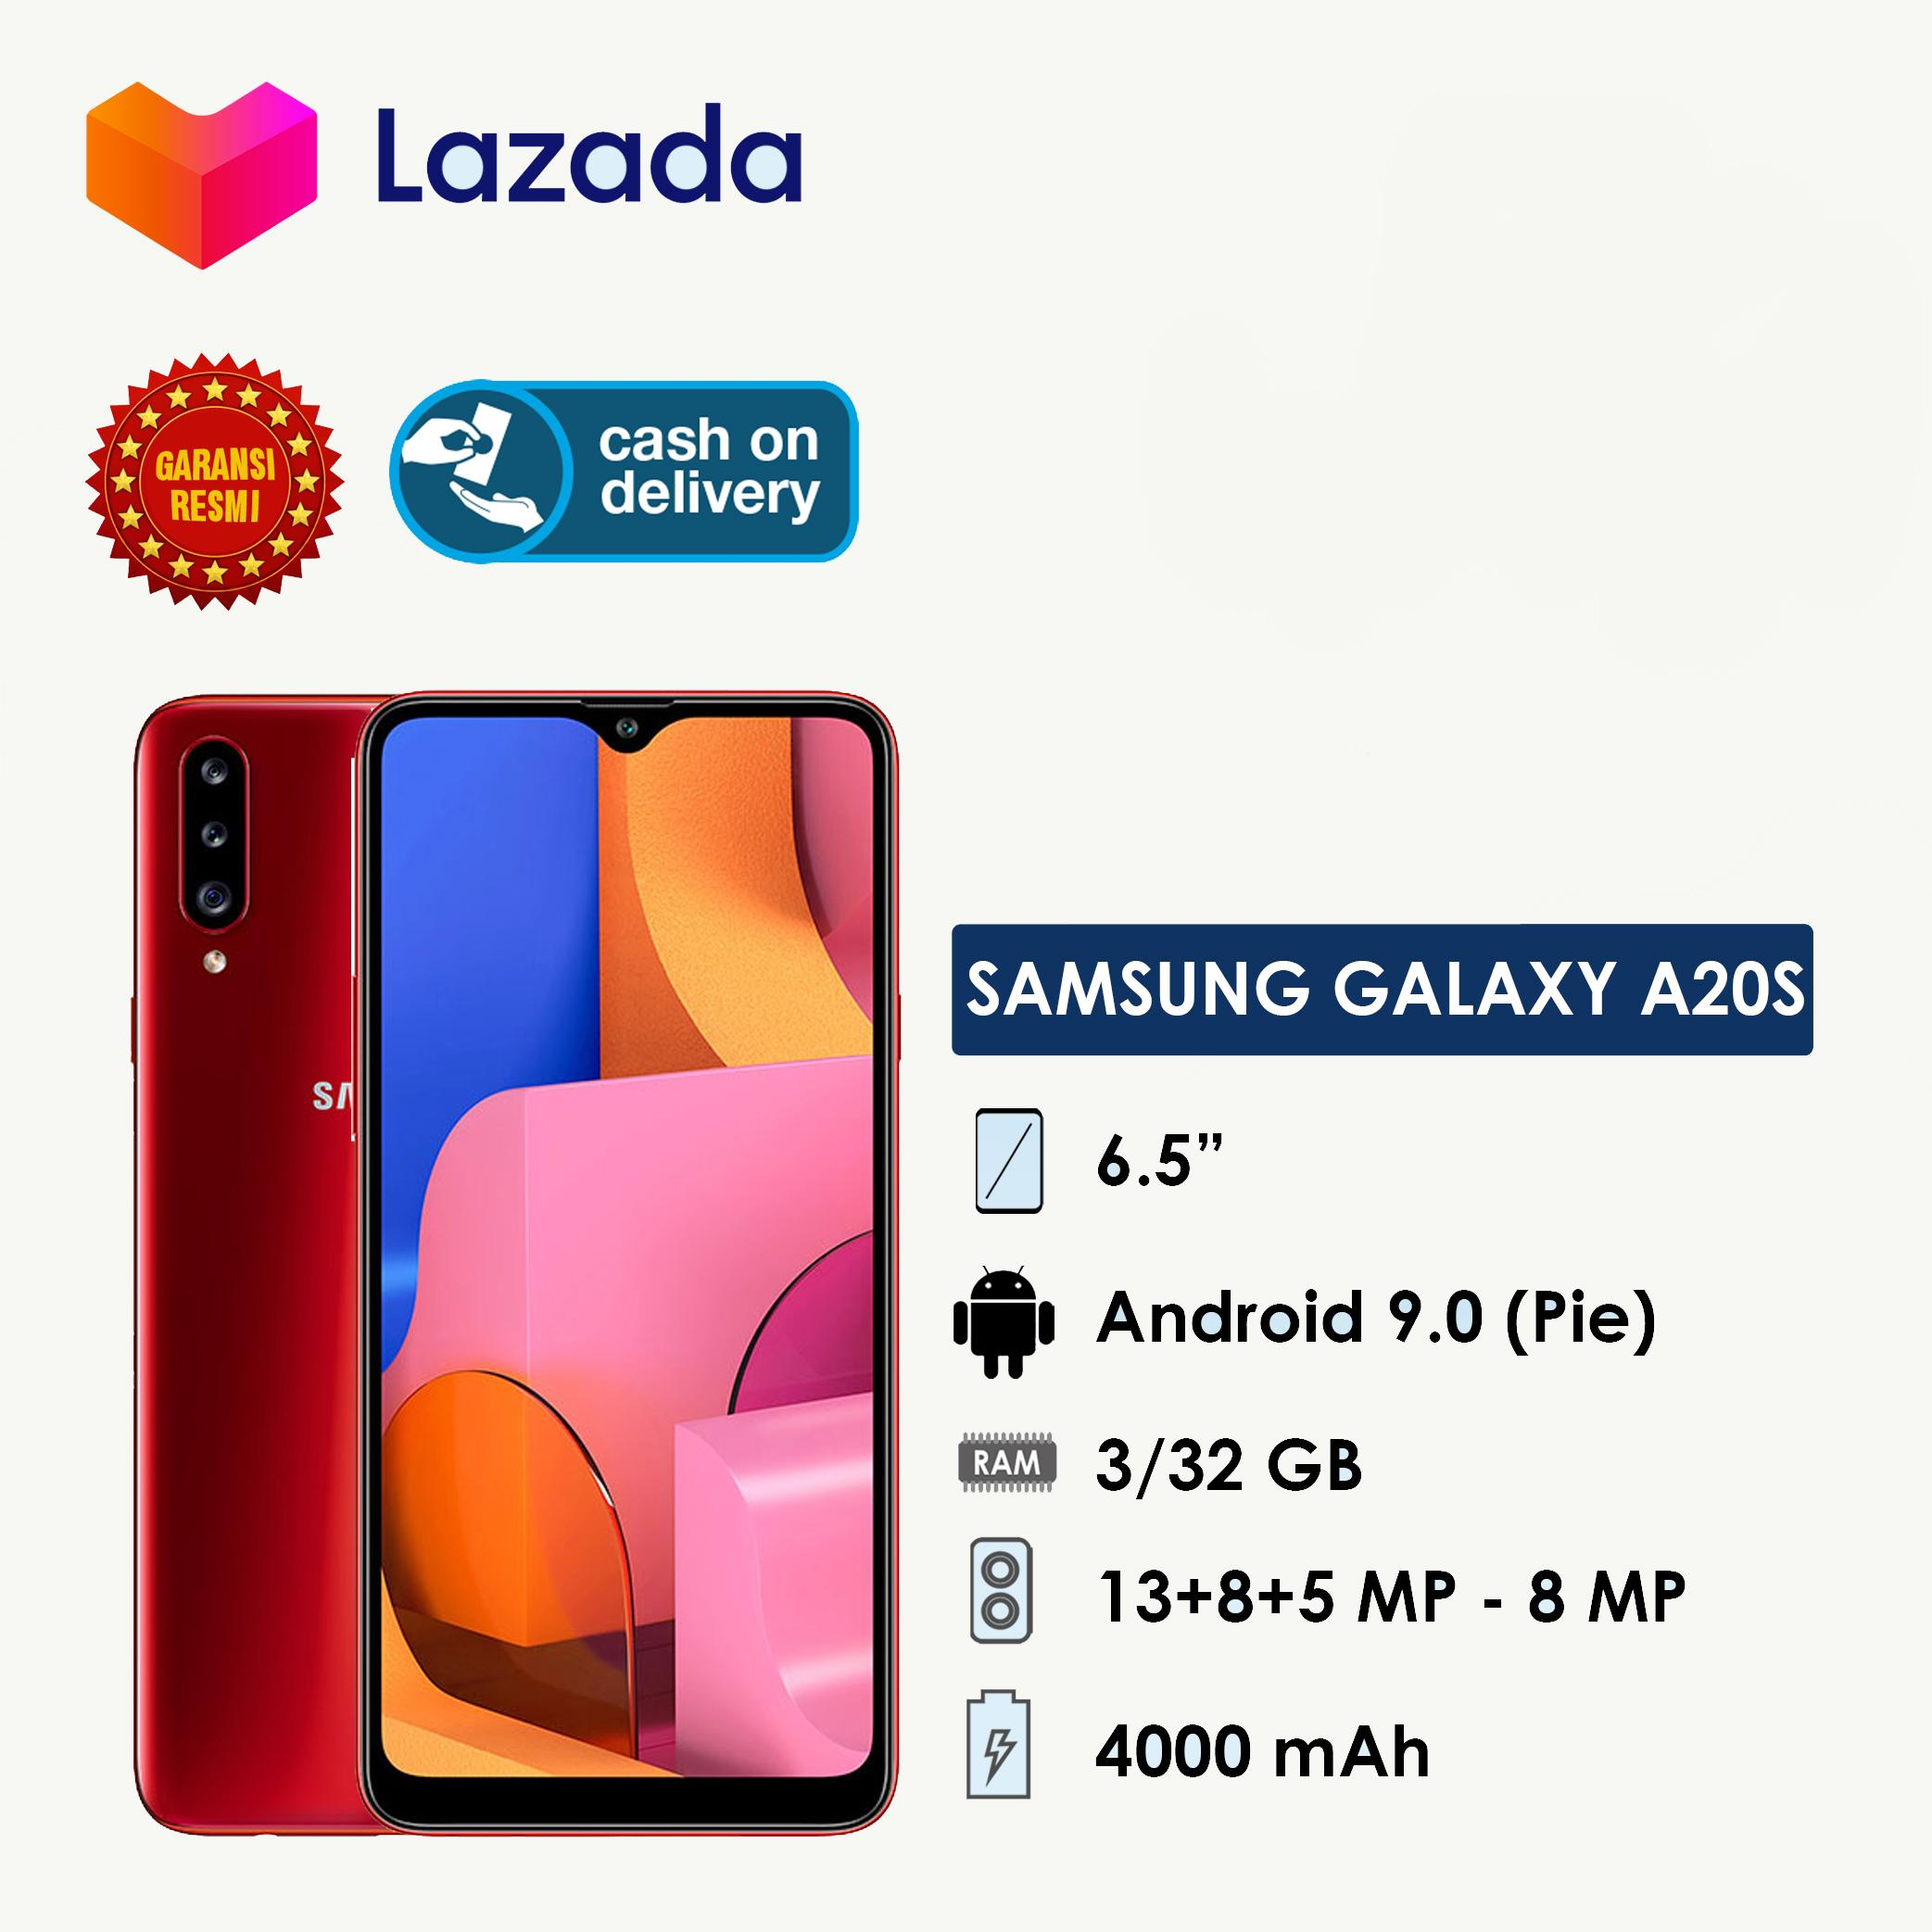 [Nantikan Diskon Terbesar di 12.12] Samsung Galaxy A20S - Garansi Resmi SEIN